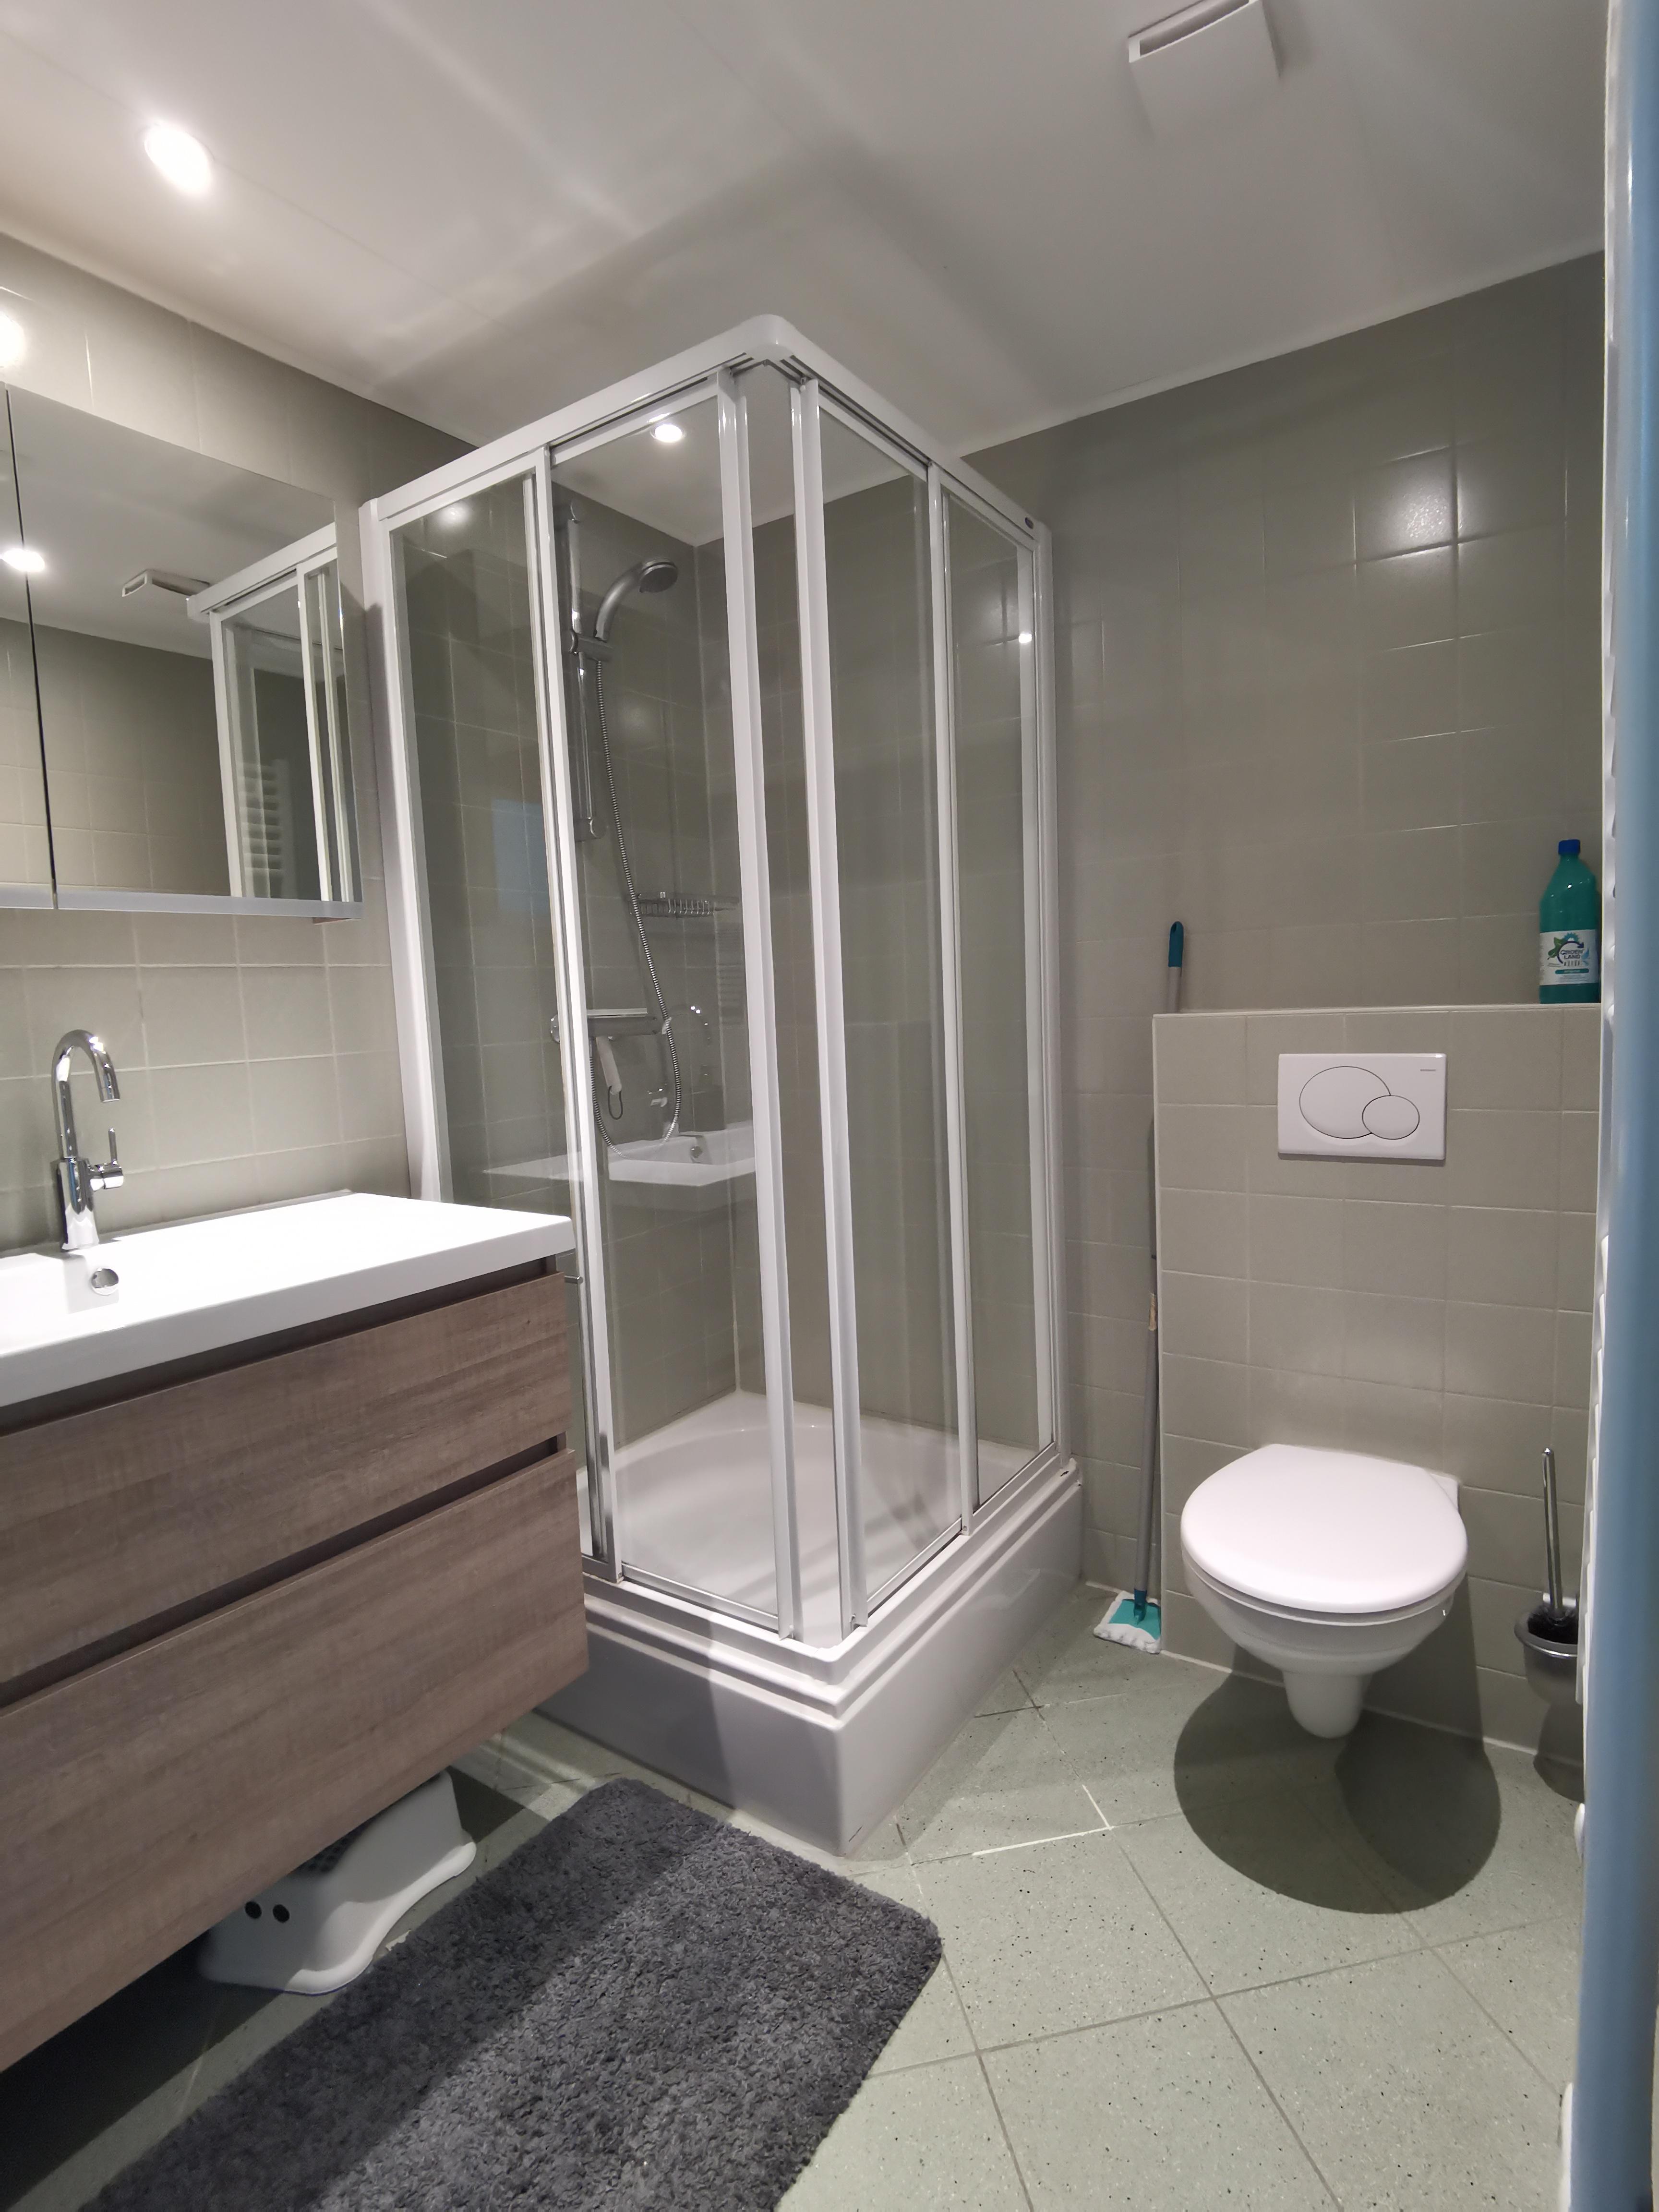 Wastafel in de badkamer boven